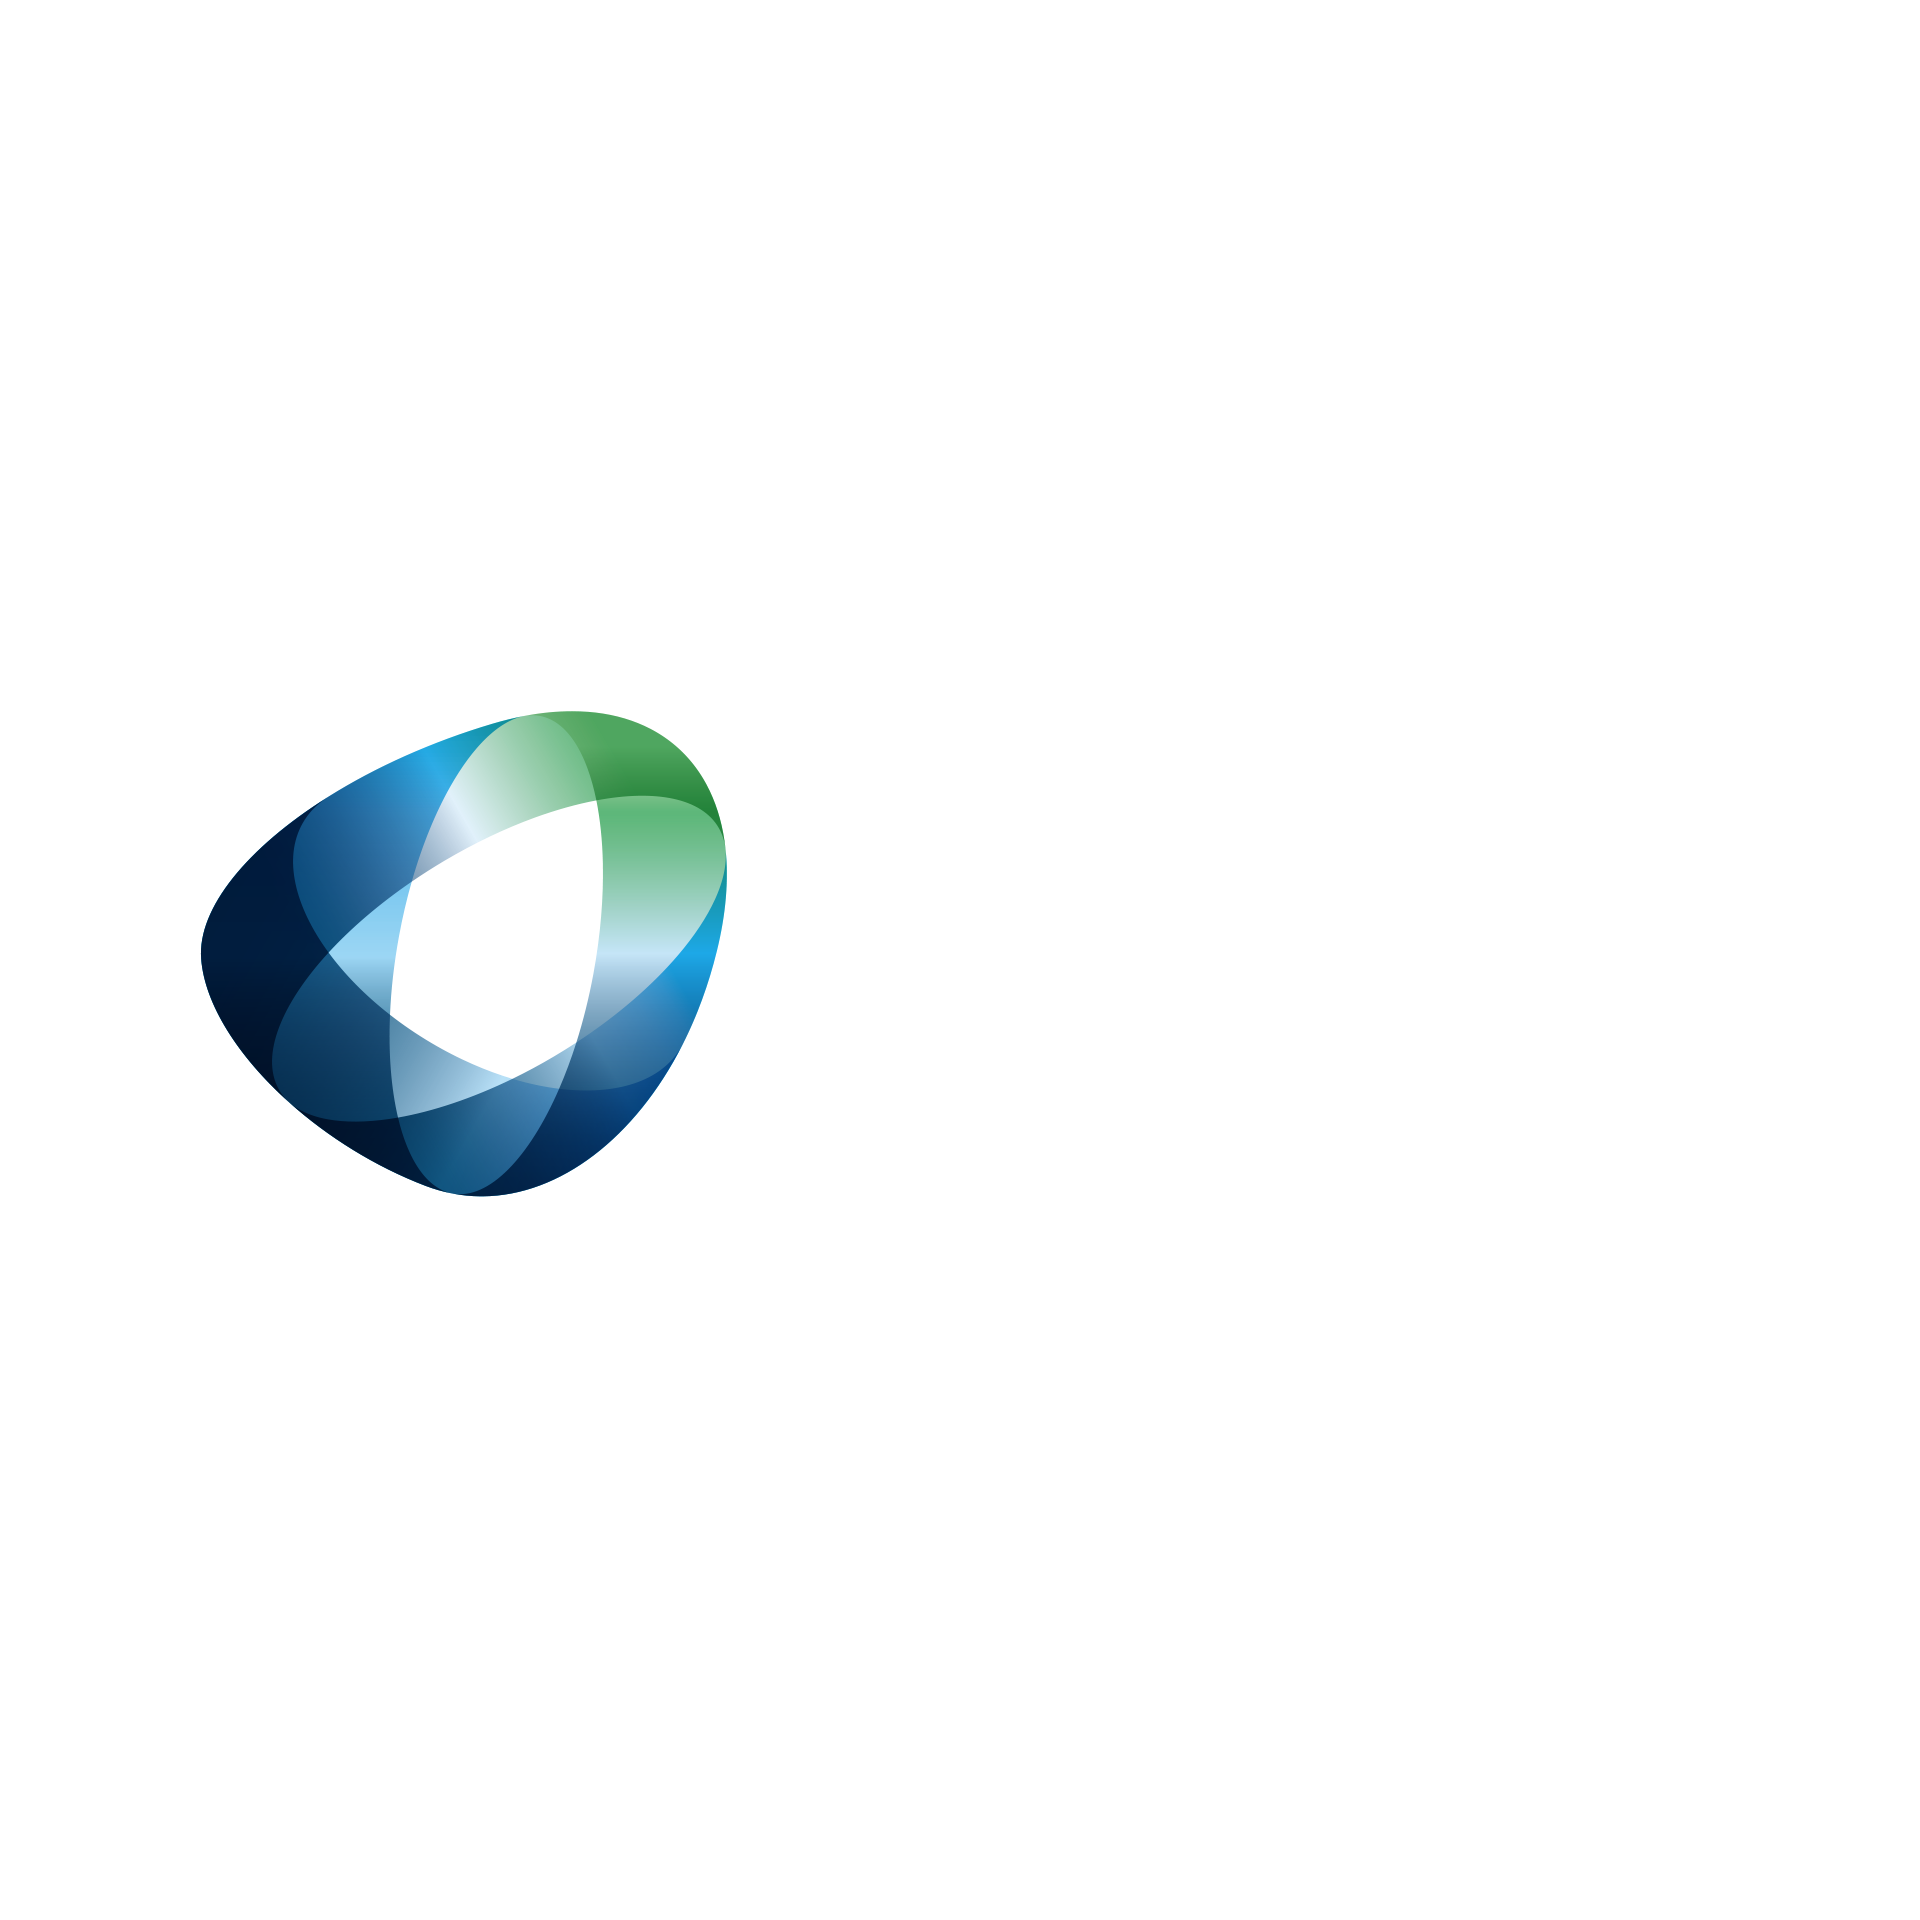 Amcor.png